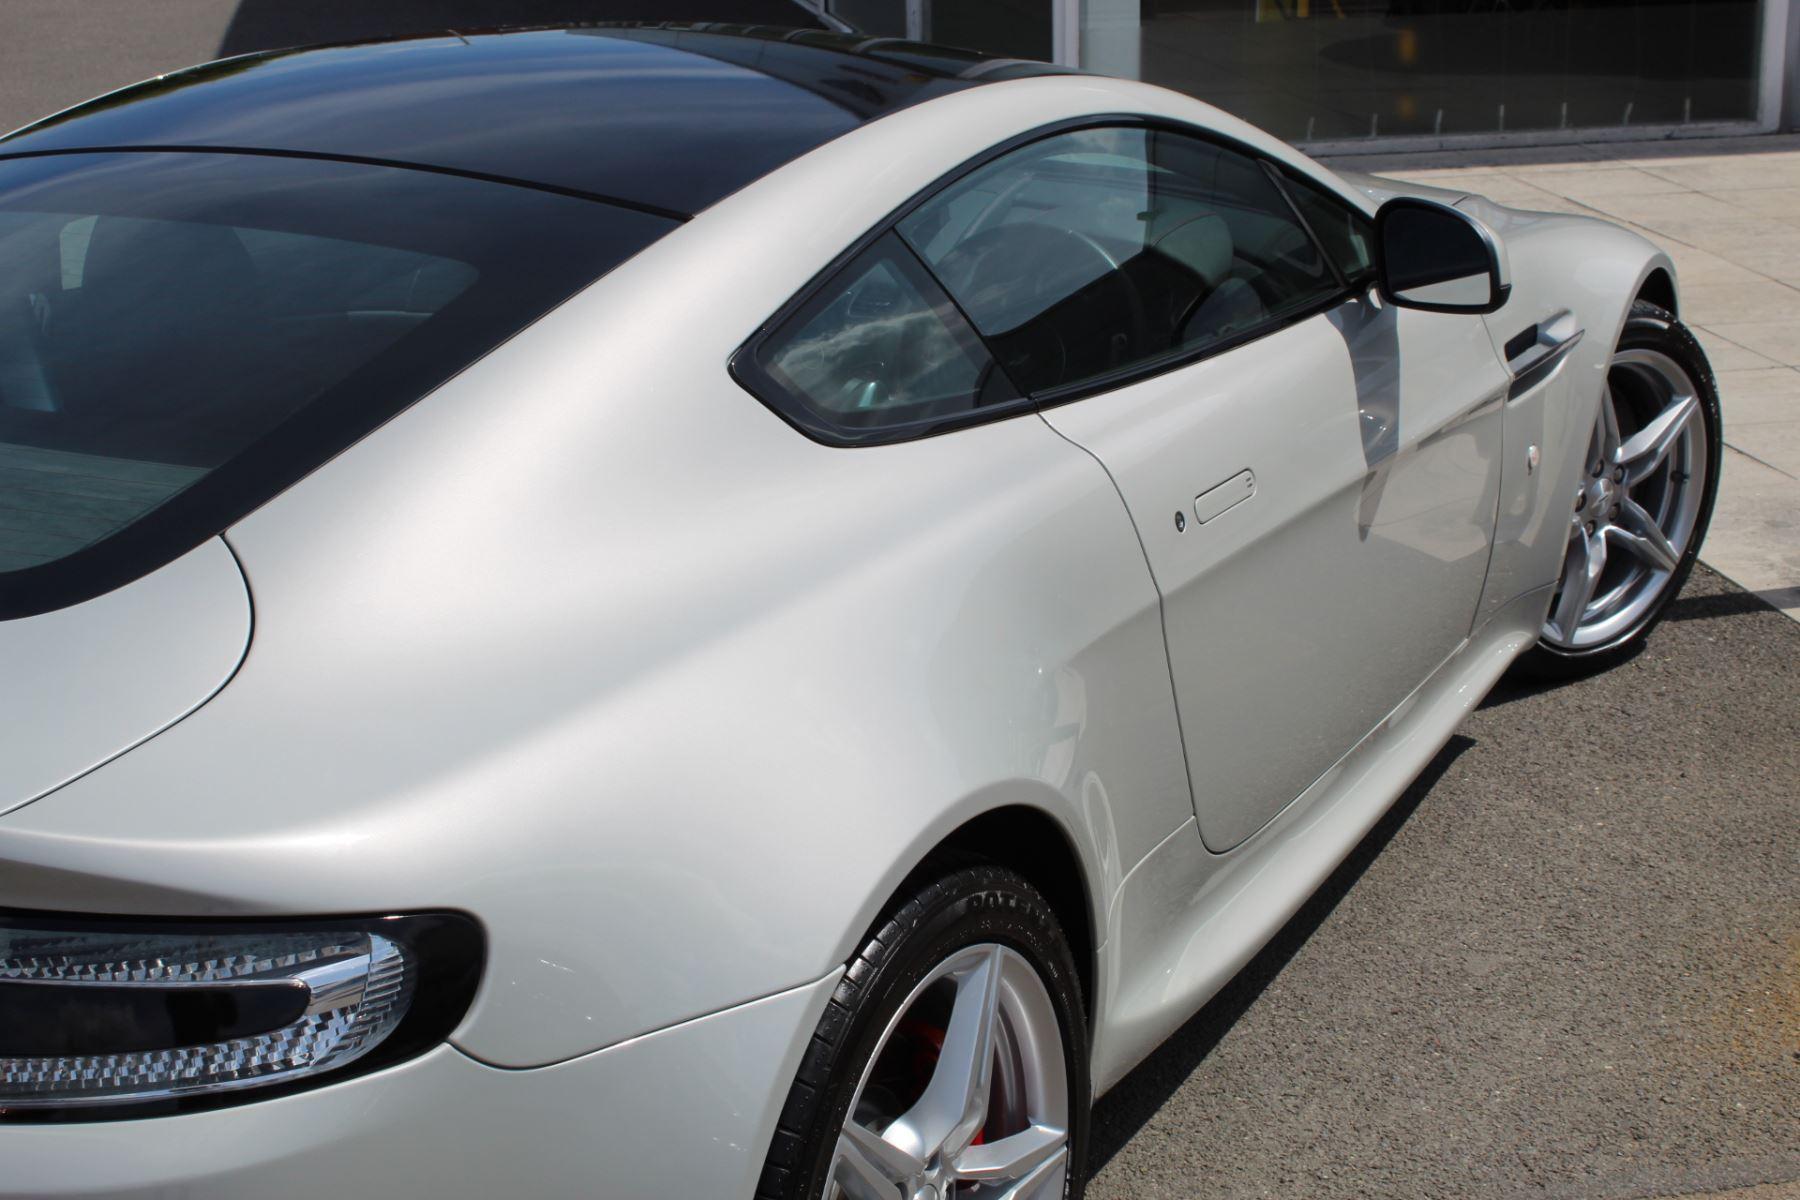 Aston Martin V8 Vantage Coupe 2dr [420] Latest Dash, 420BHP image 19